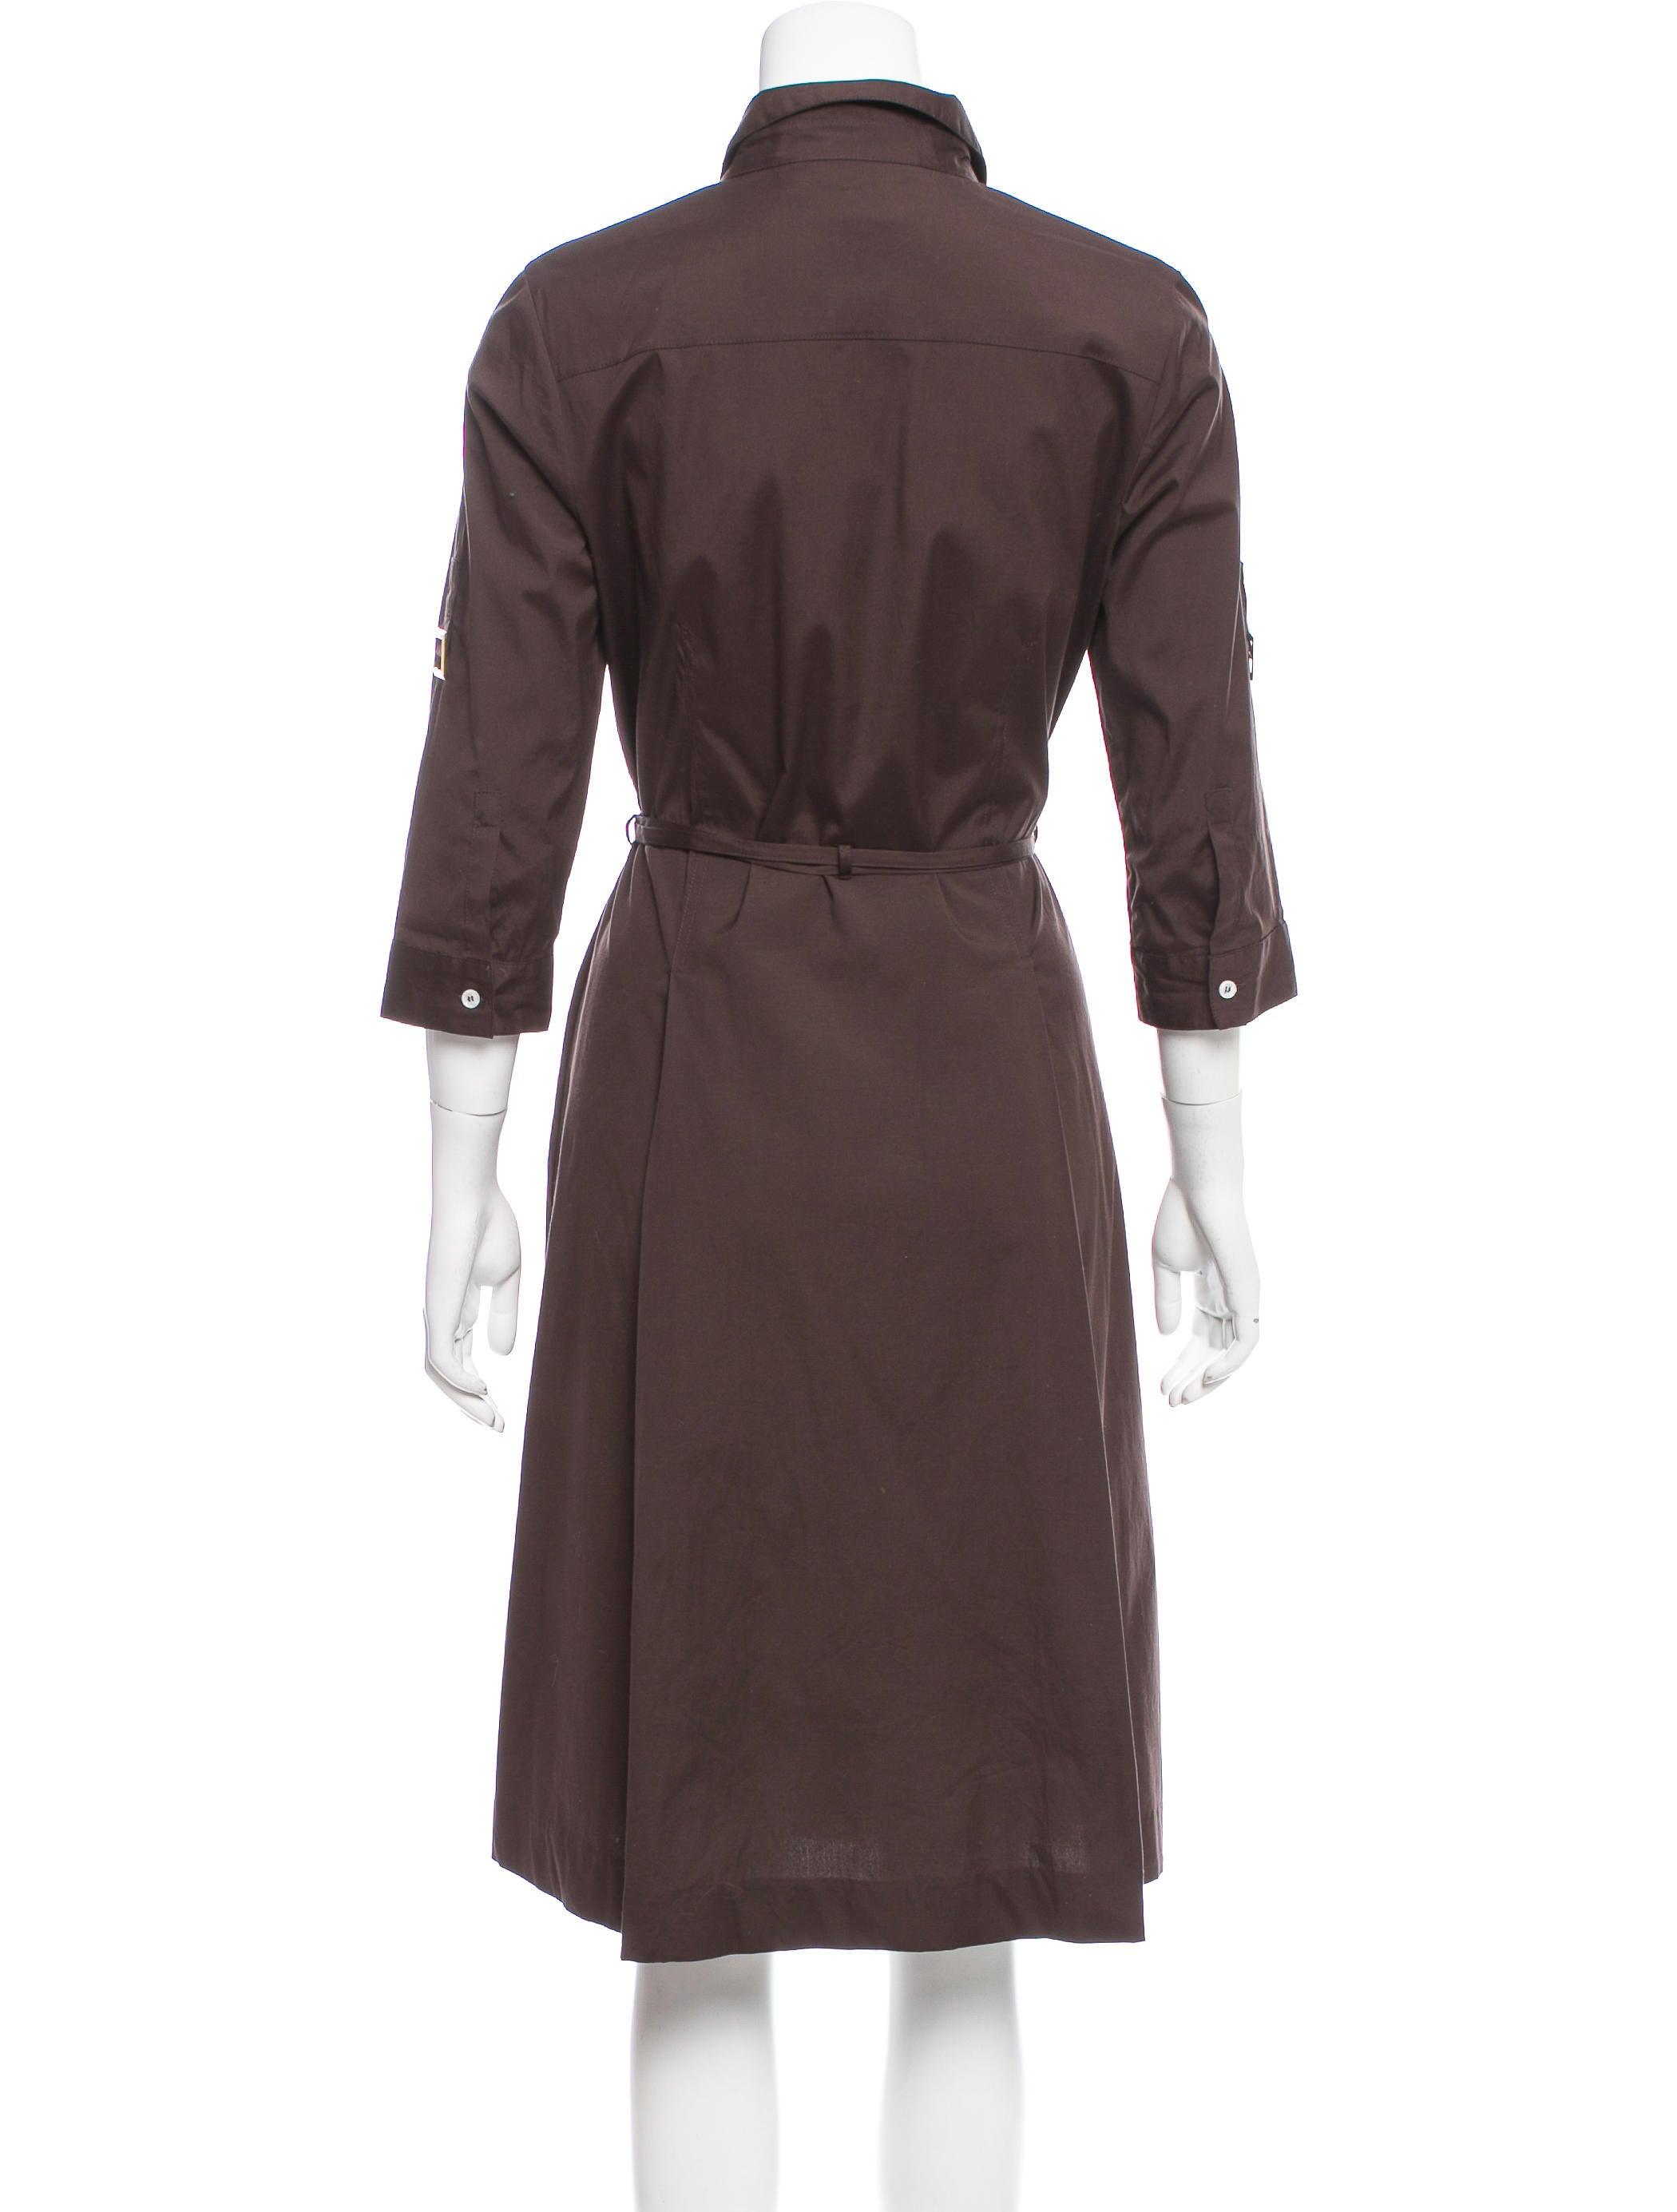 Tory Burch Long Sleeve Shirt Dress Clothing Wto96808